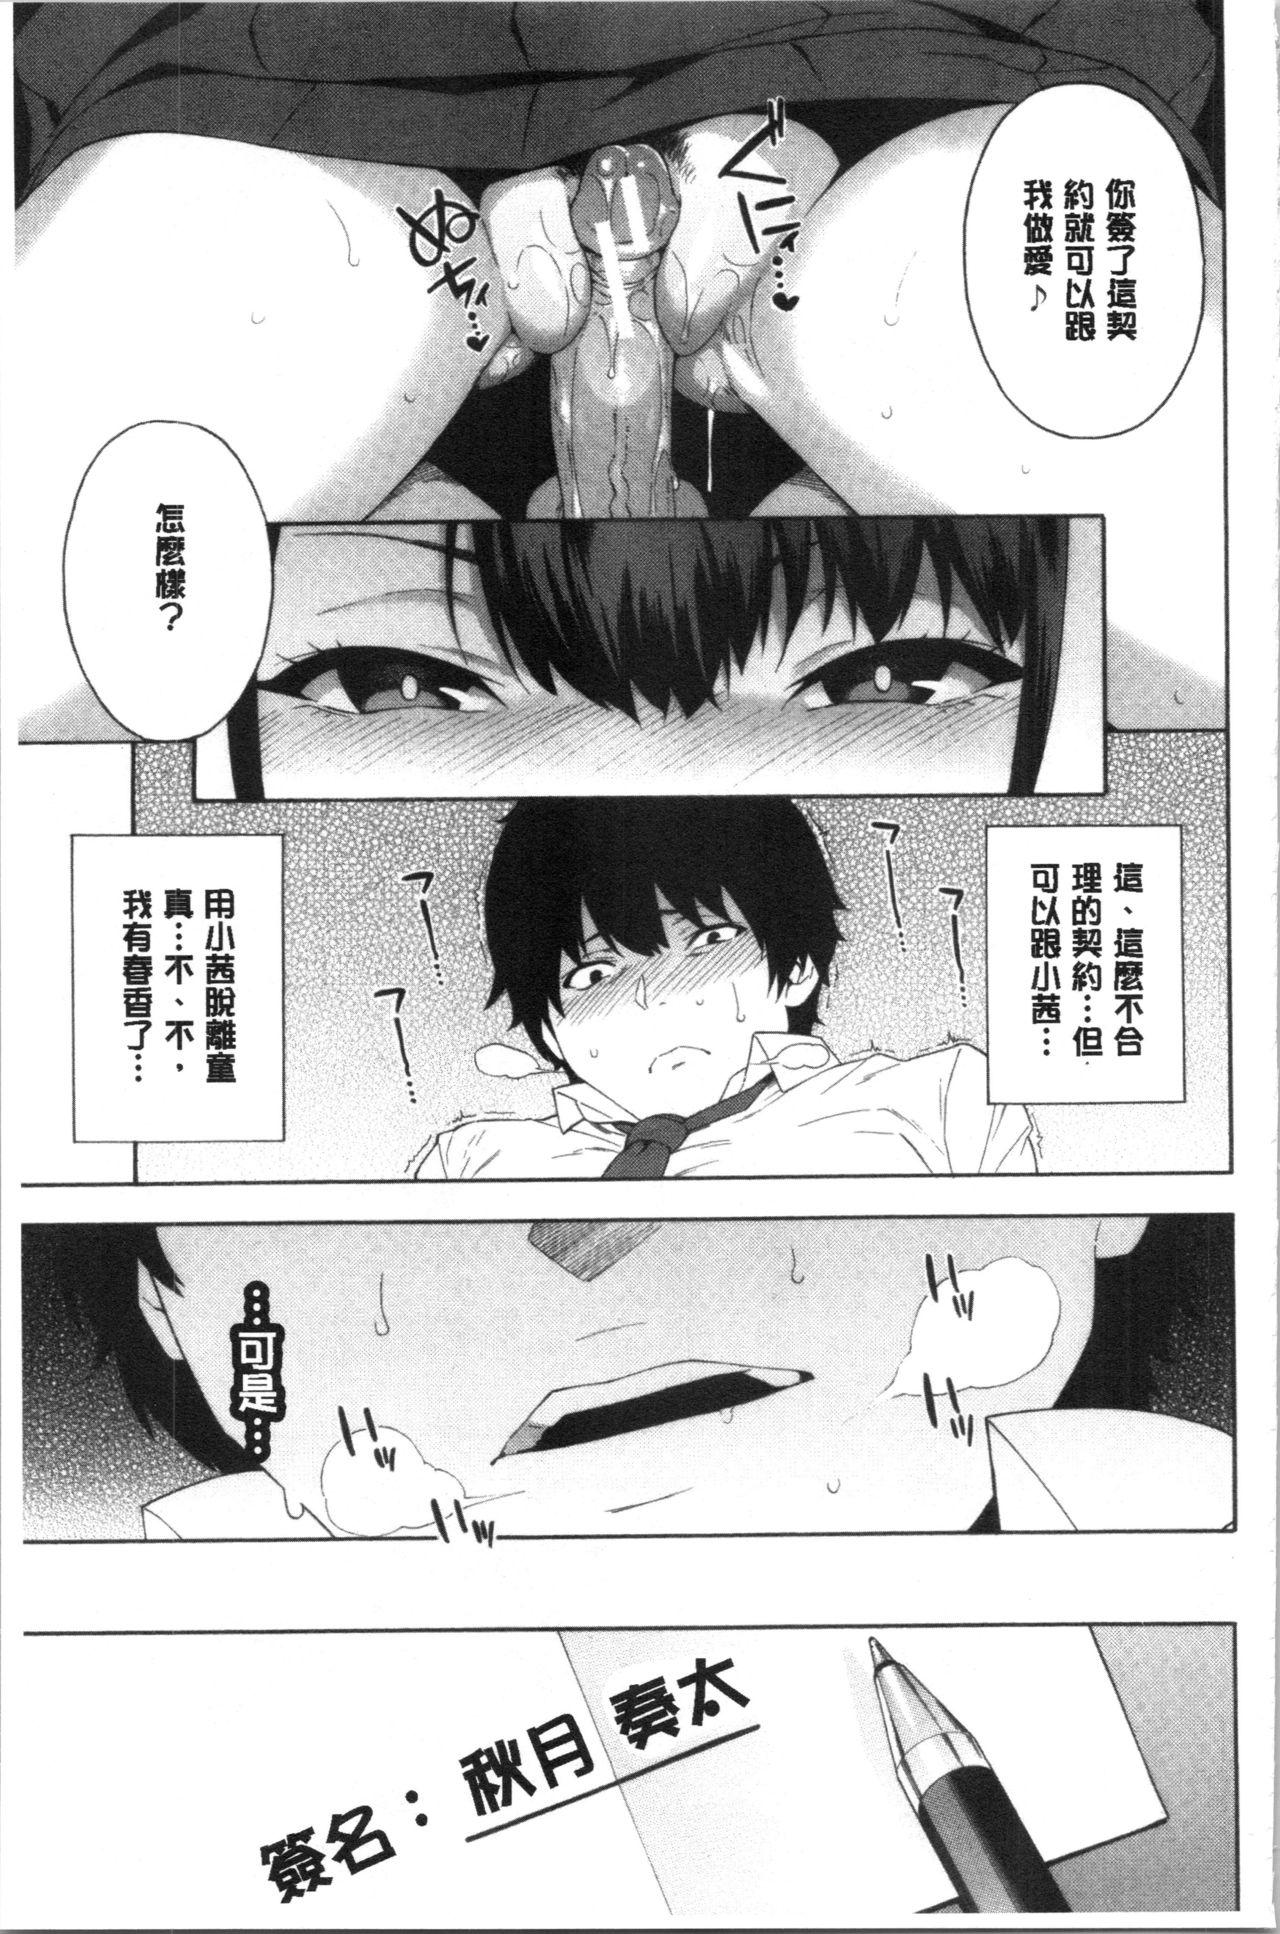 Okashite Ageru | 讓你來侵犯我 93